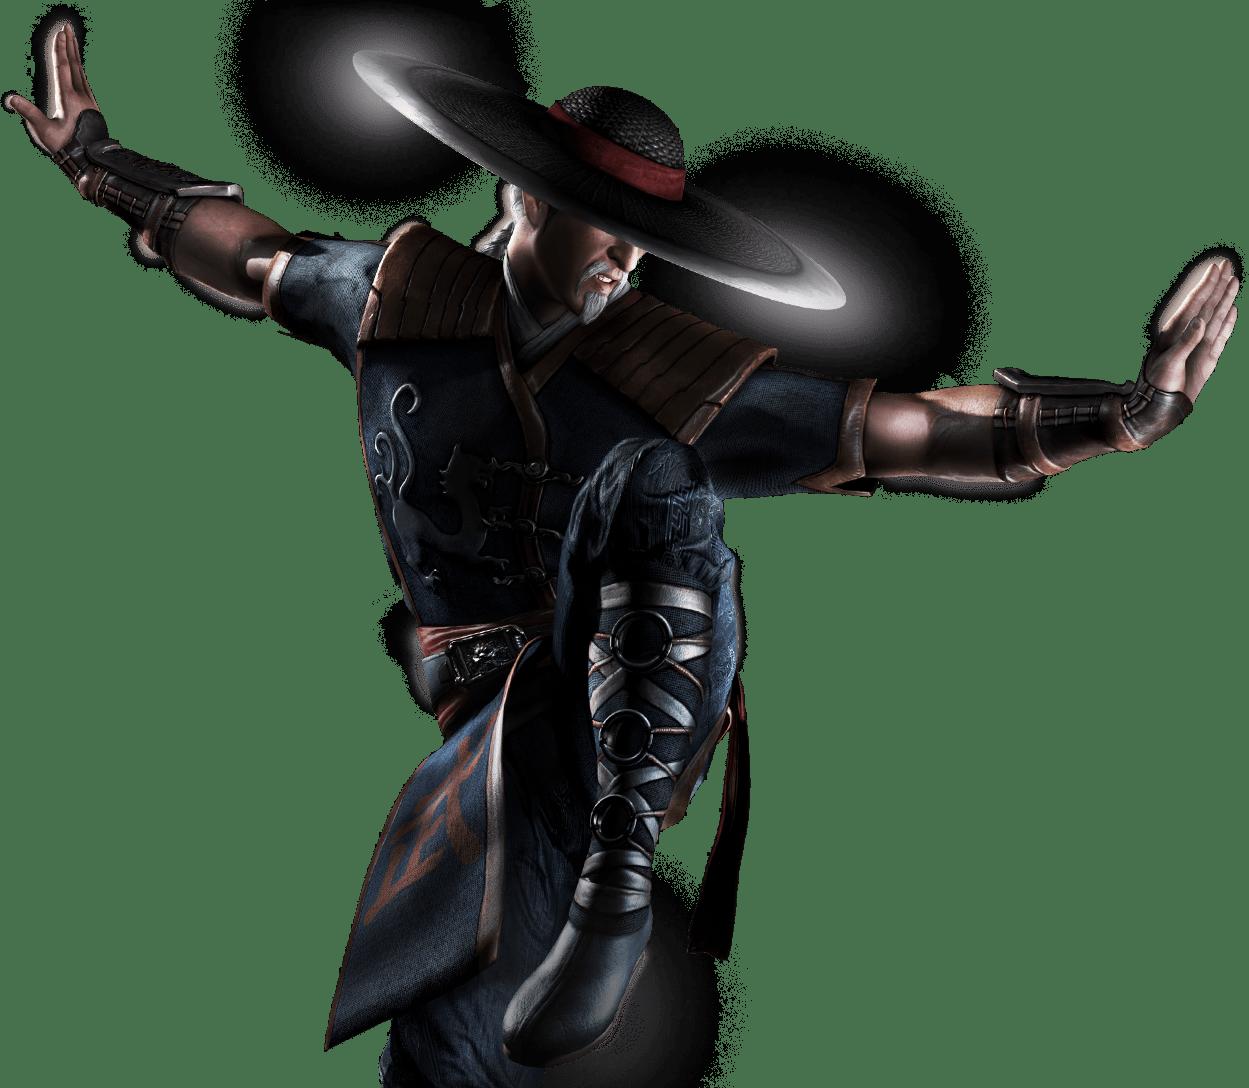 Jason Voorhees 3d Wallpaper Mkwarehouse Mortal Kombat X Kung Lao